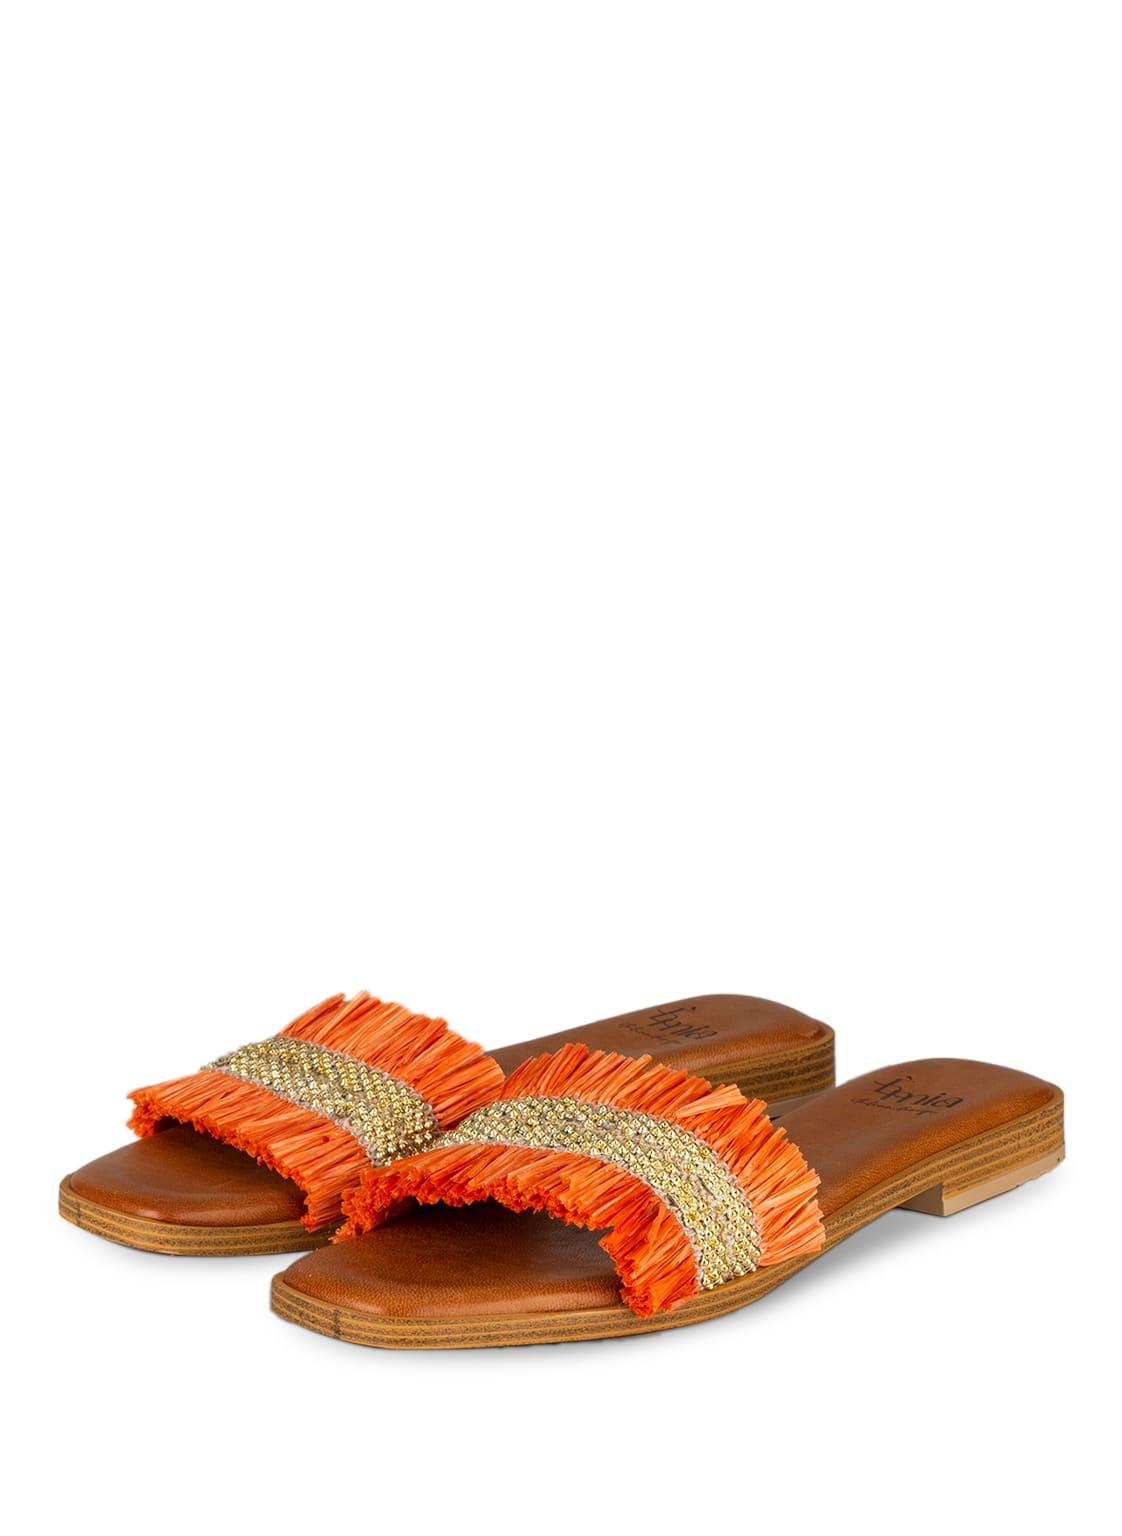 Image of È Mia Pantoletten orange